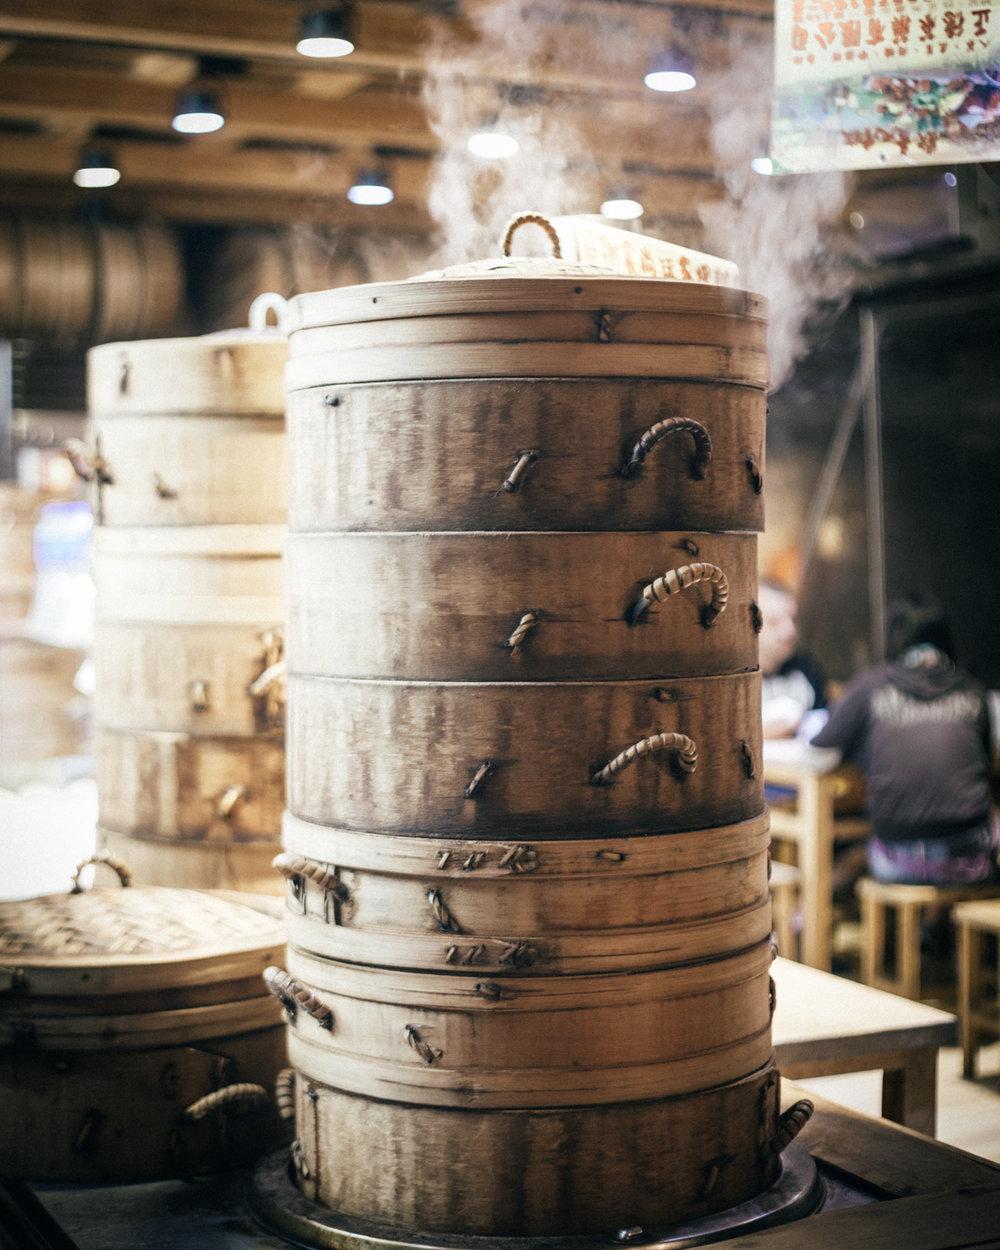 The street food of Jiufen Old Street